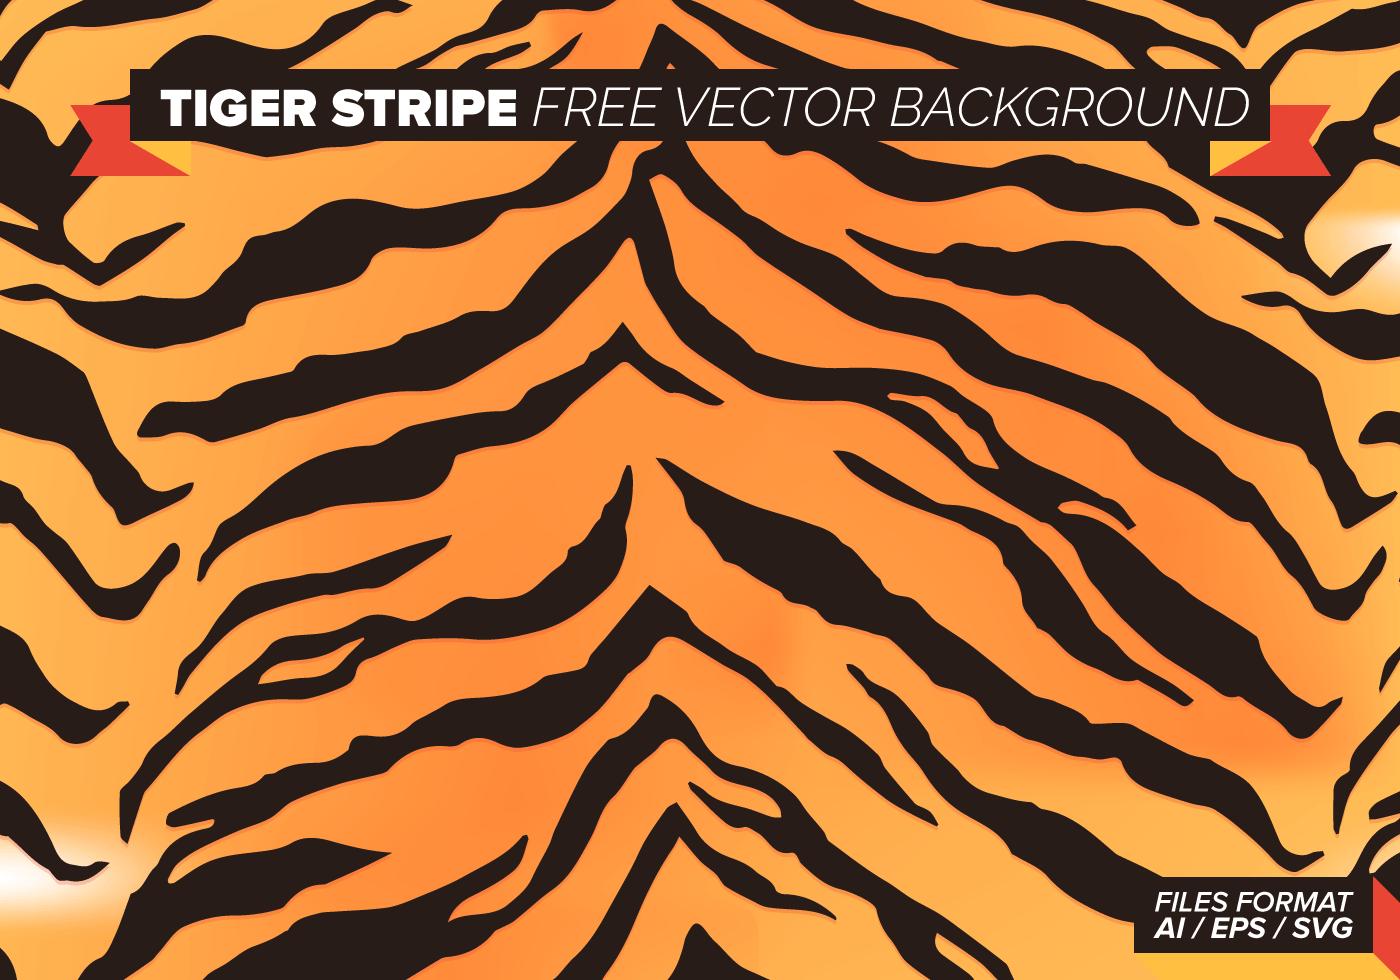 Tiger Stripe Free Vector Background